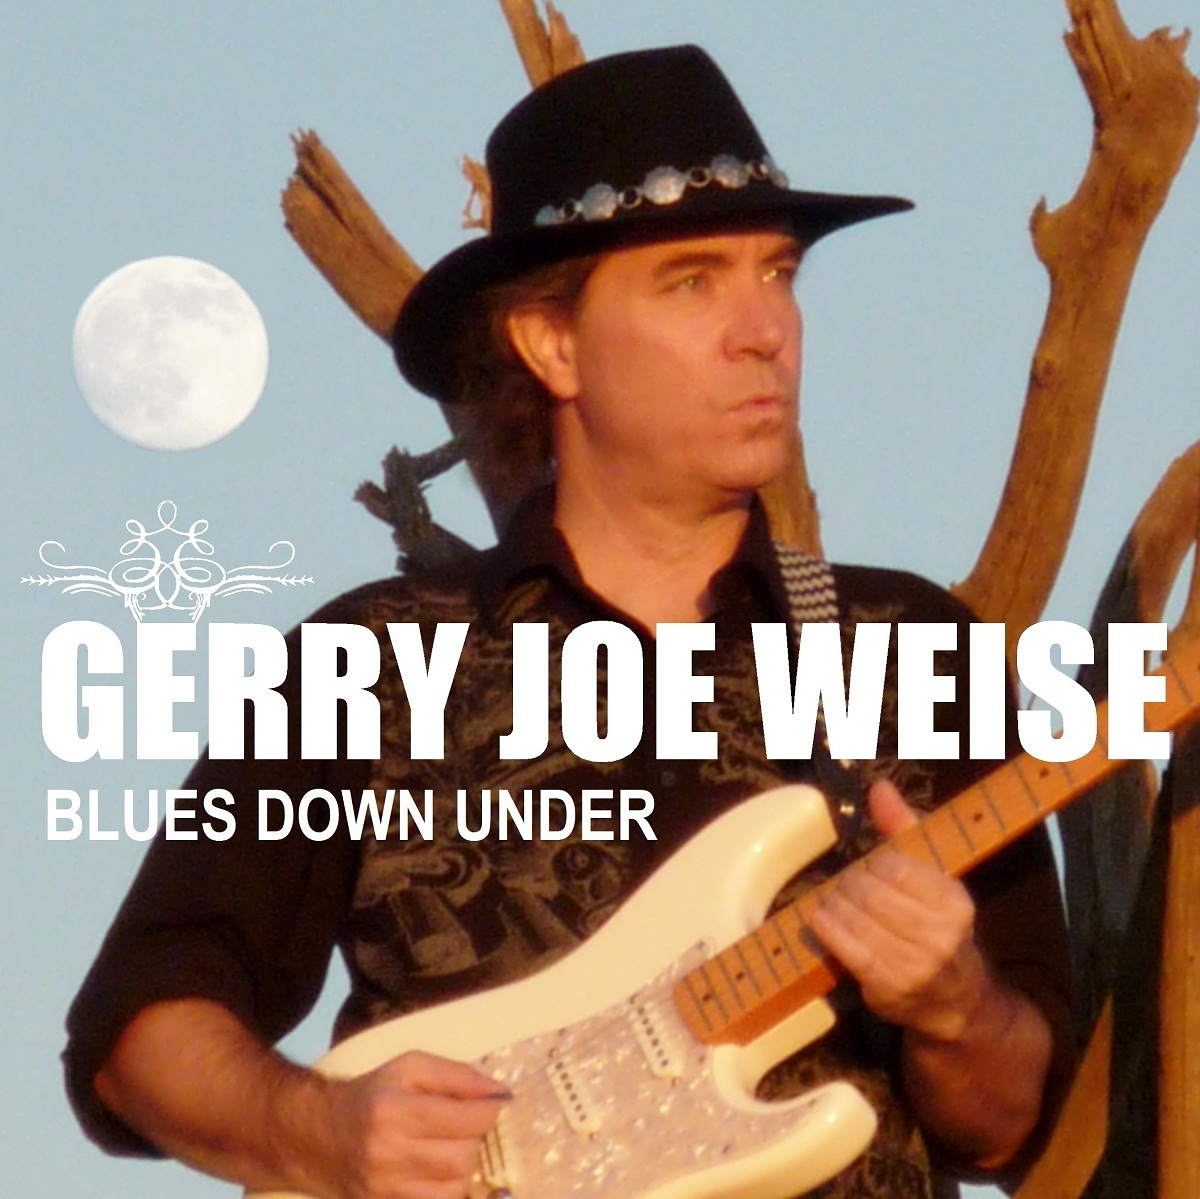 Blues Down Under, 2009 album